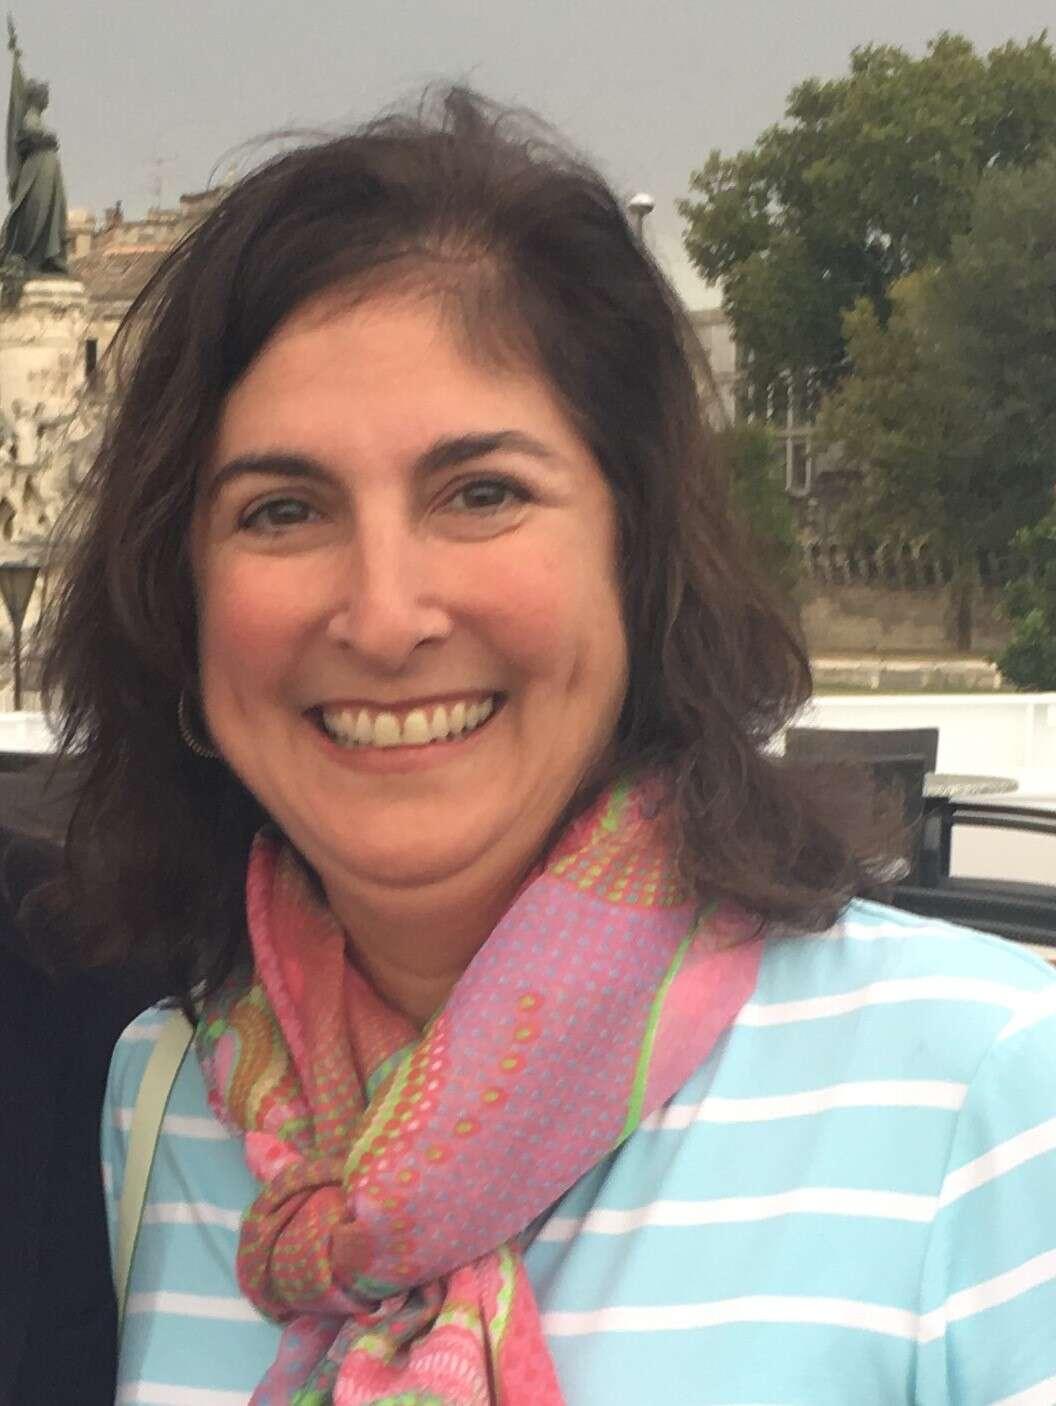 Julie McKelvey